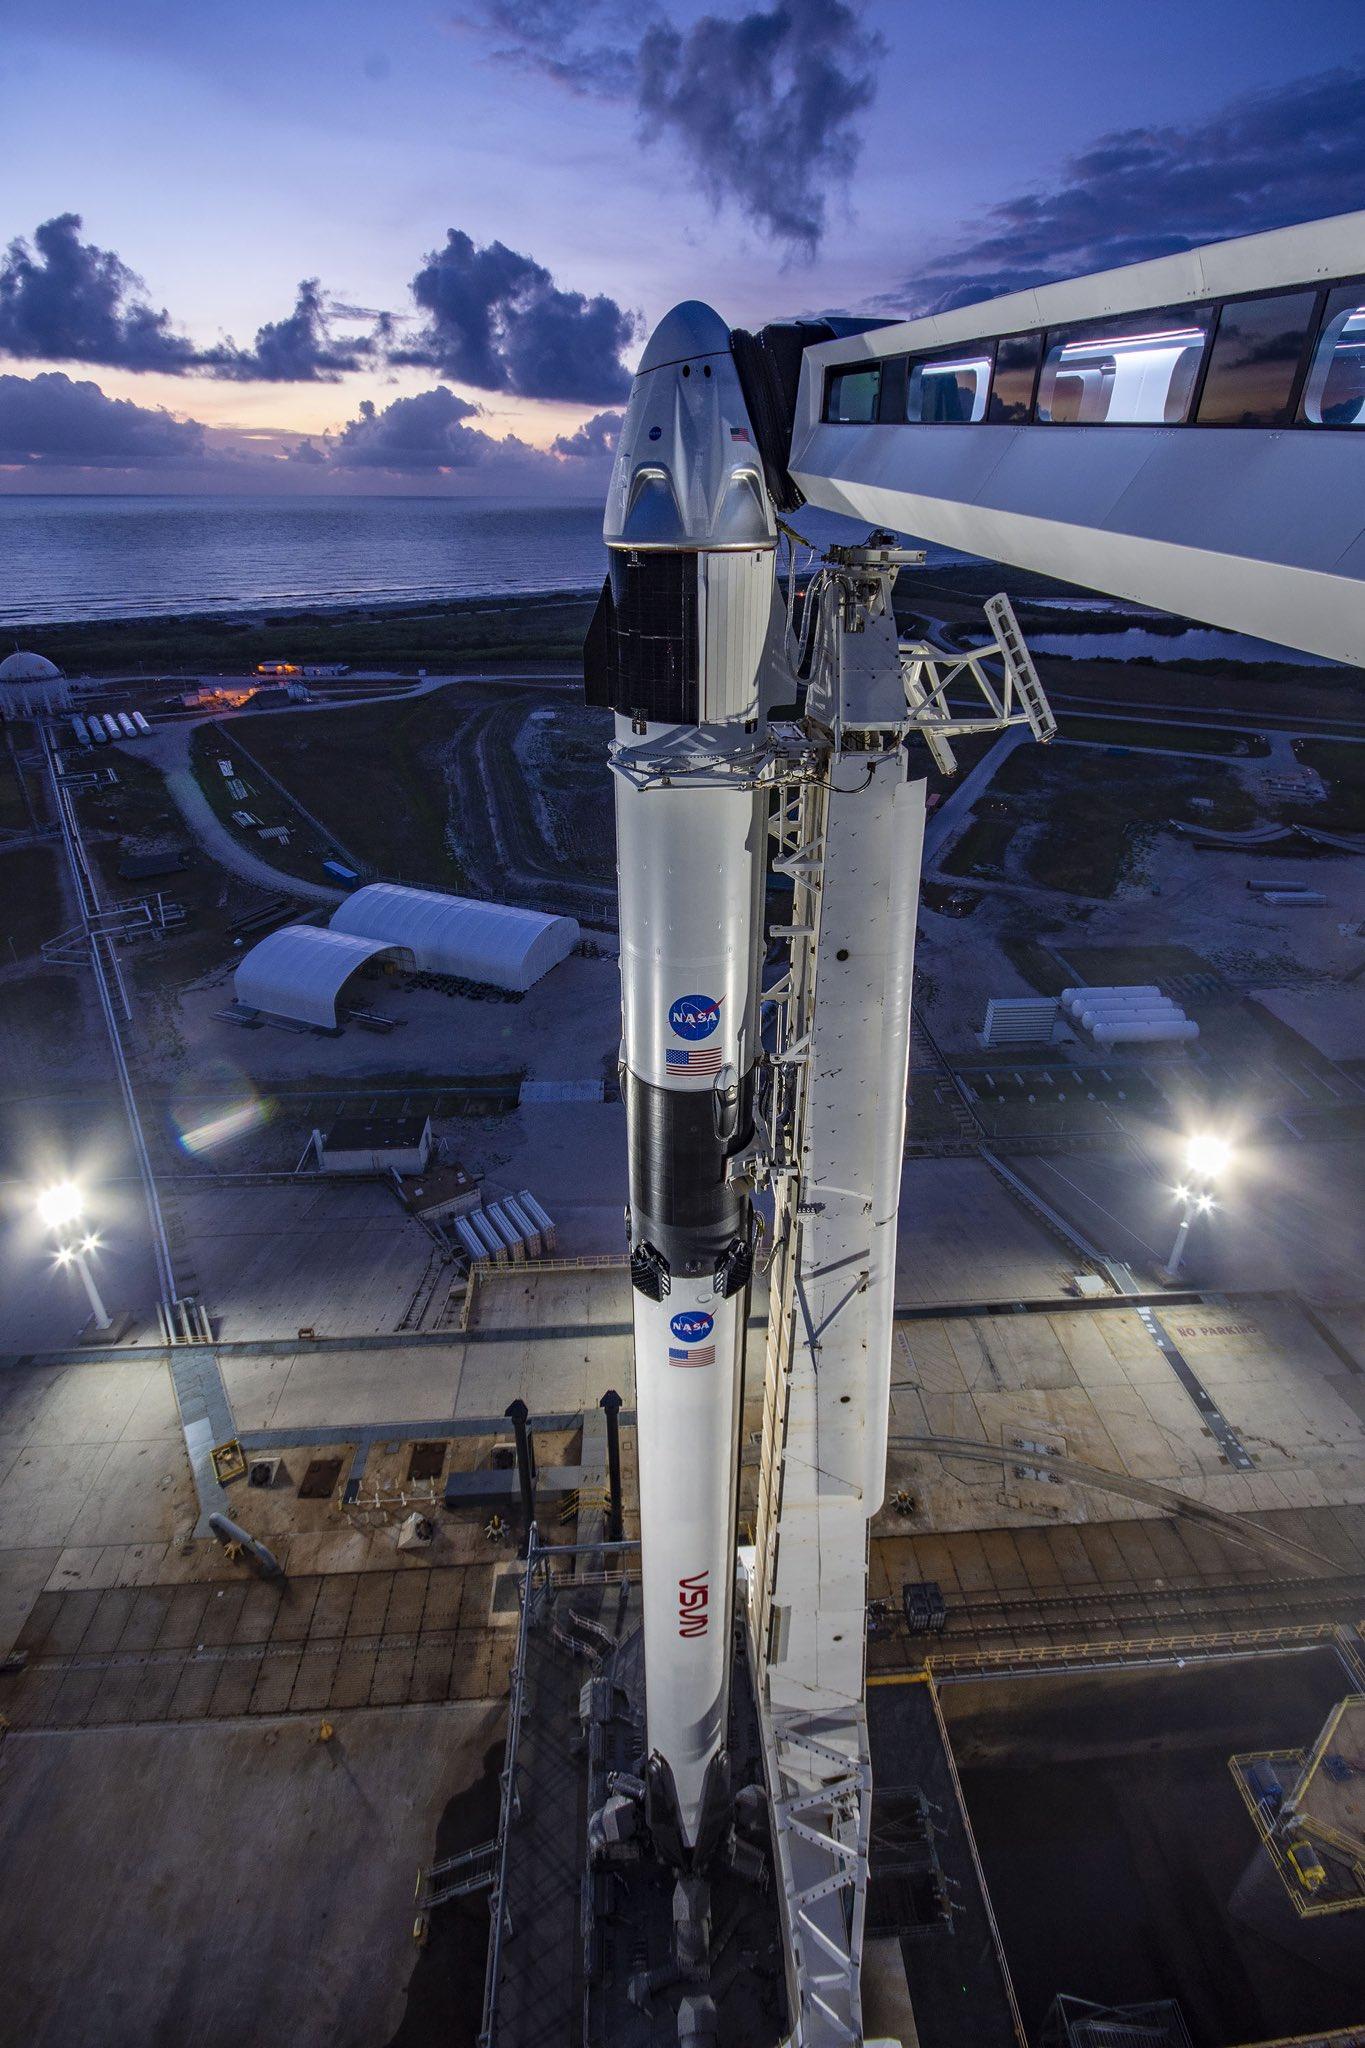 crew-dragon-on-launch-pad.jpg